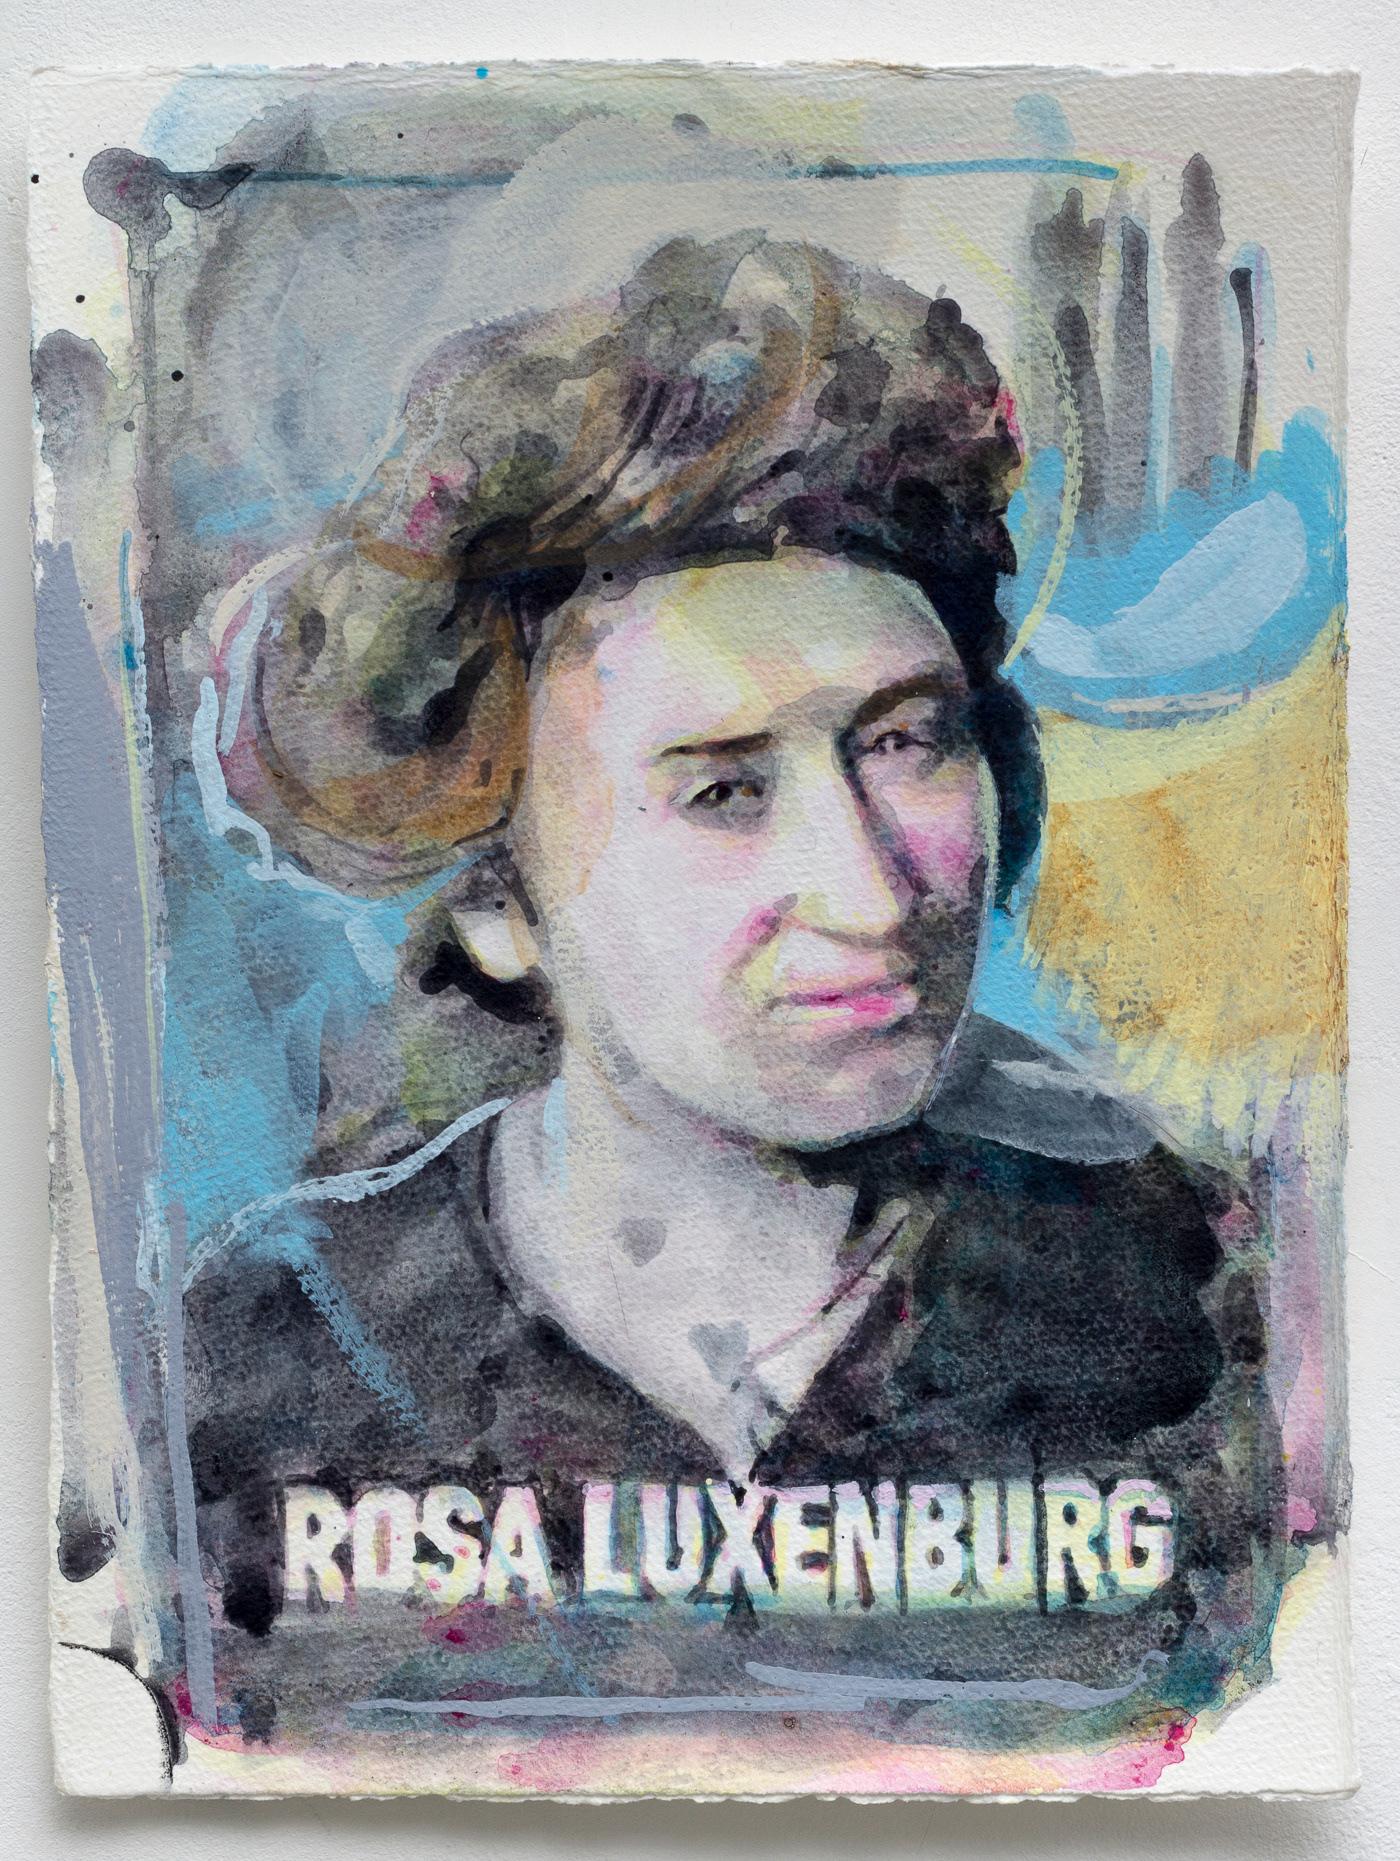 Rosa Luxenburg Rosa Luxenburg